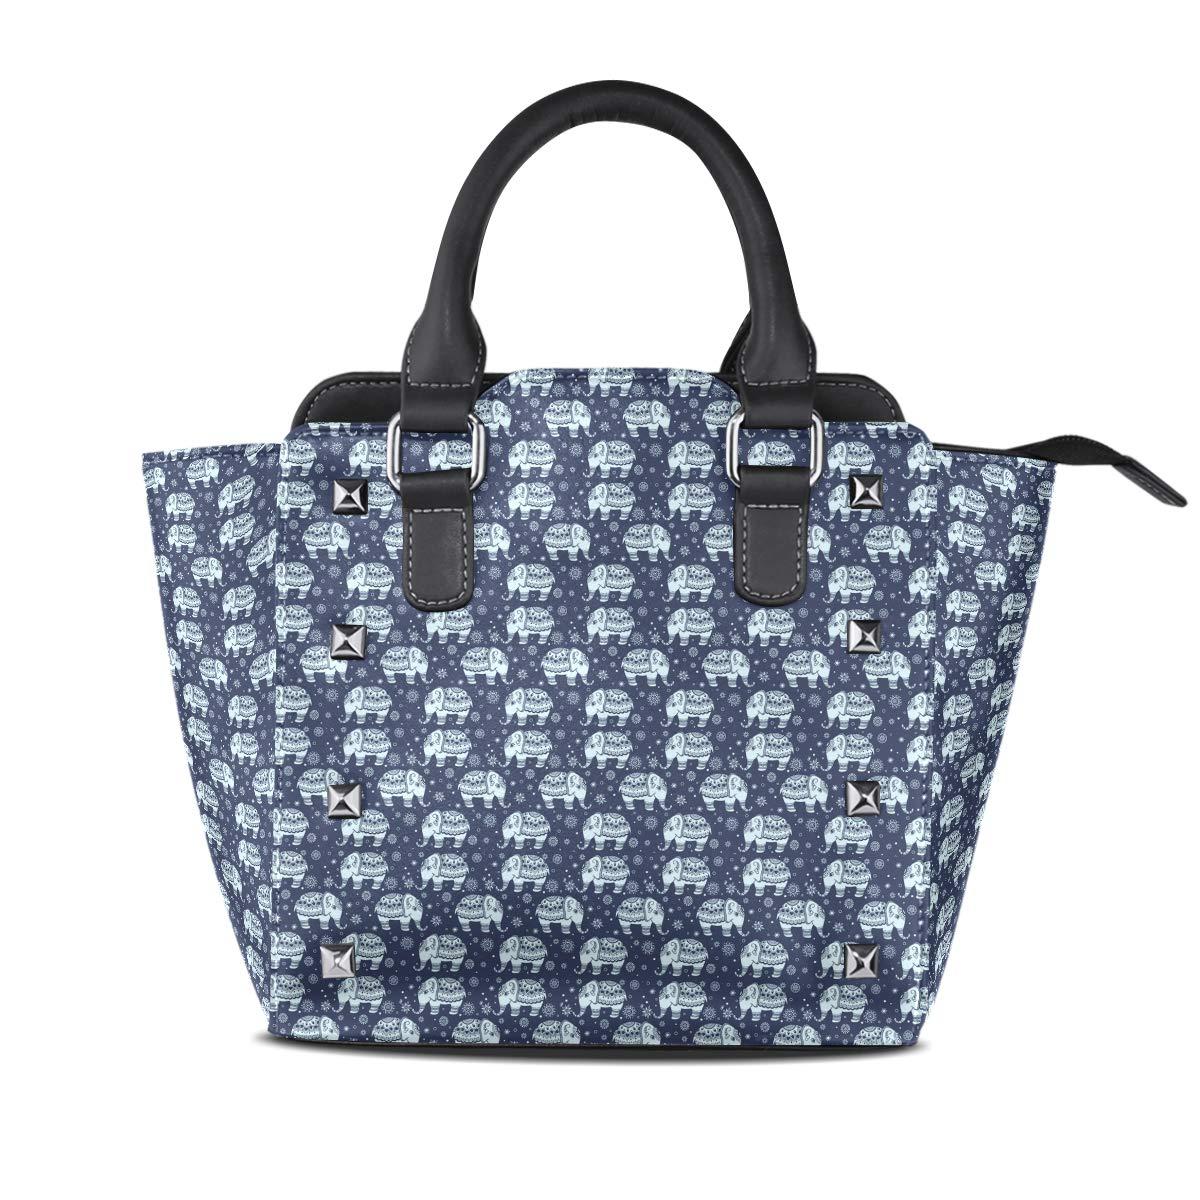 Design4 Handbag Beautiful Butterfly Genuine Leather Tote Rivet Bag Shoulder Strap Top Handle Women